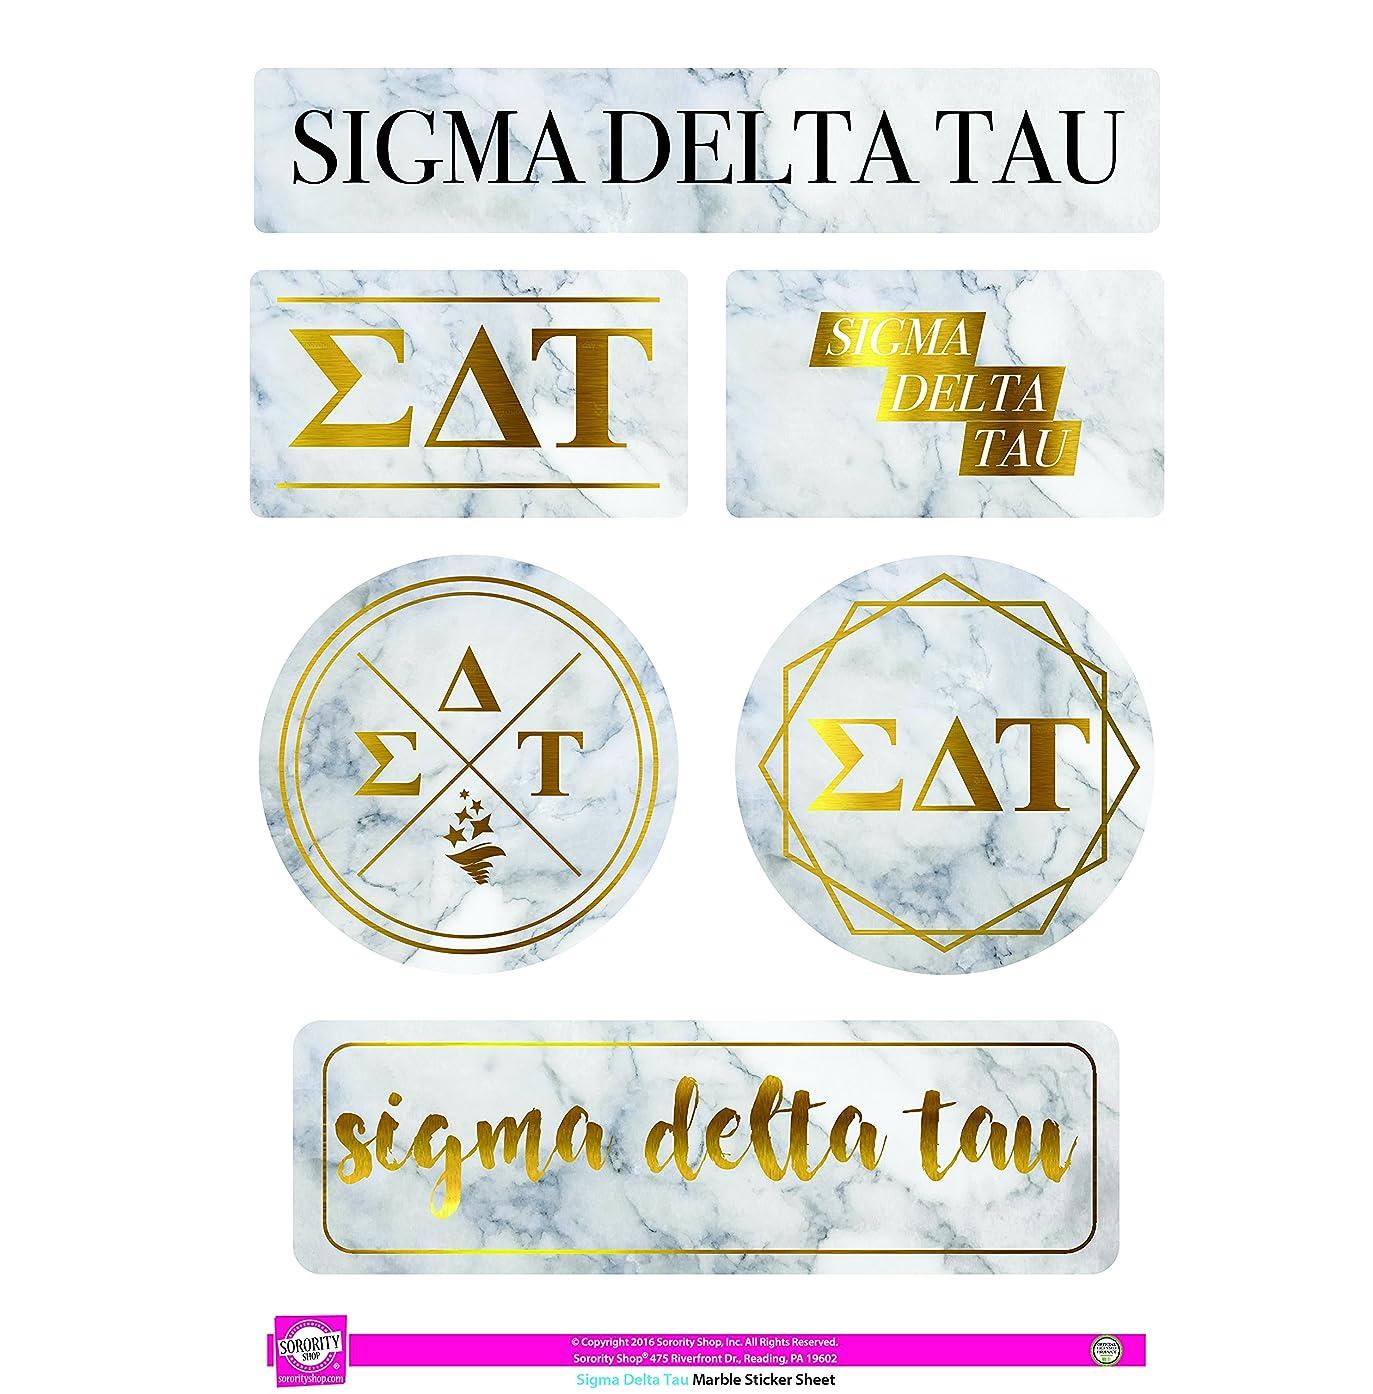 Sigma Delta Tau - Sticker Sheet - Marble Theme